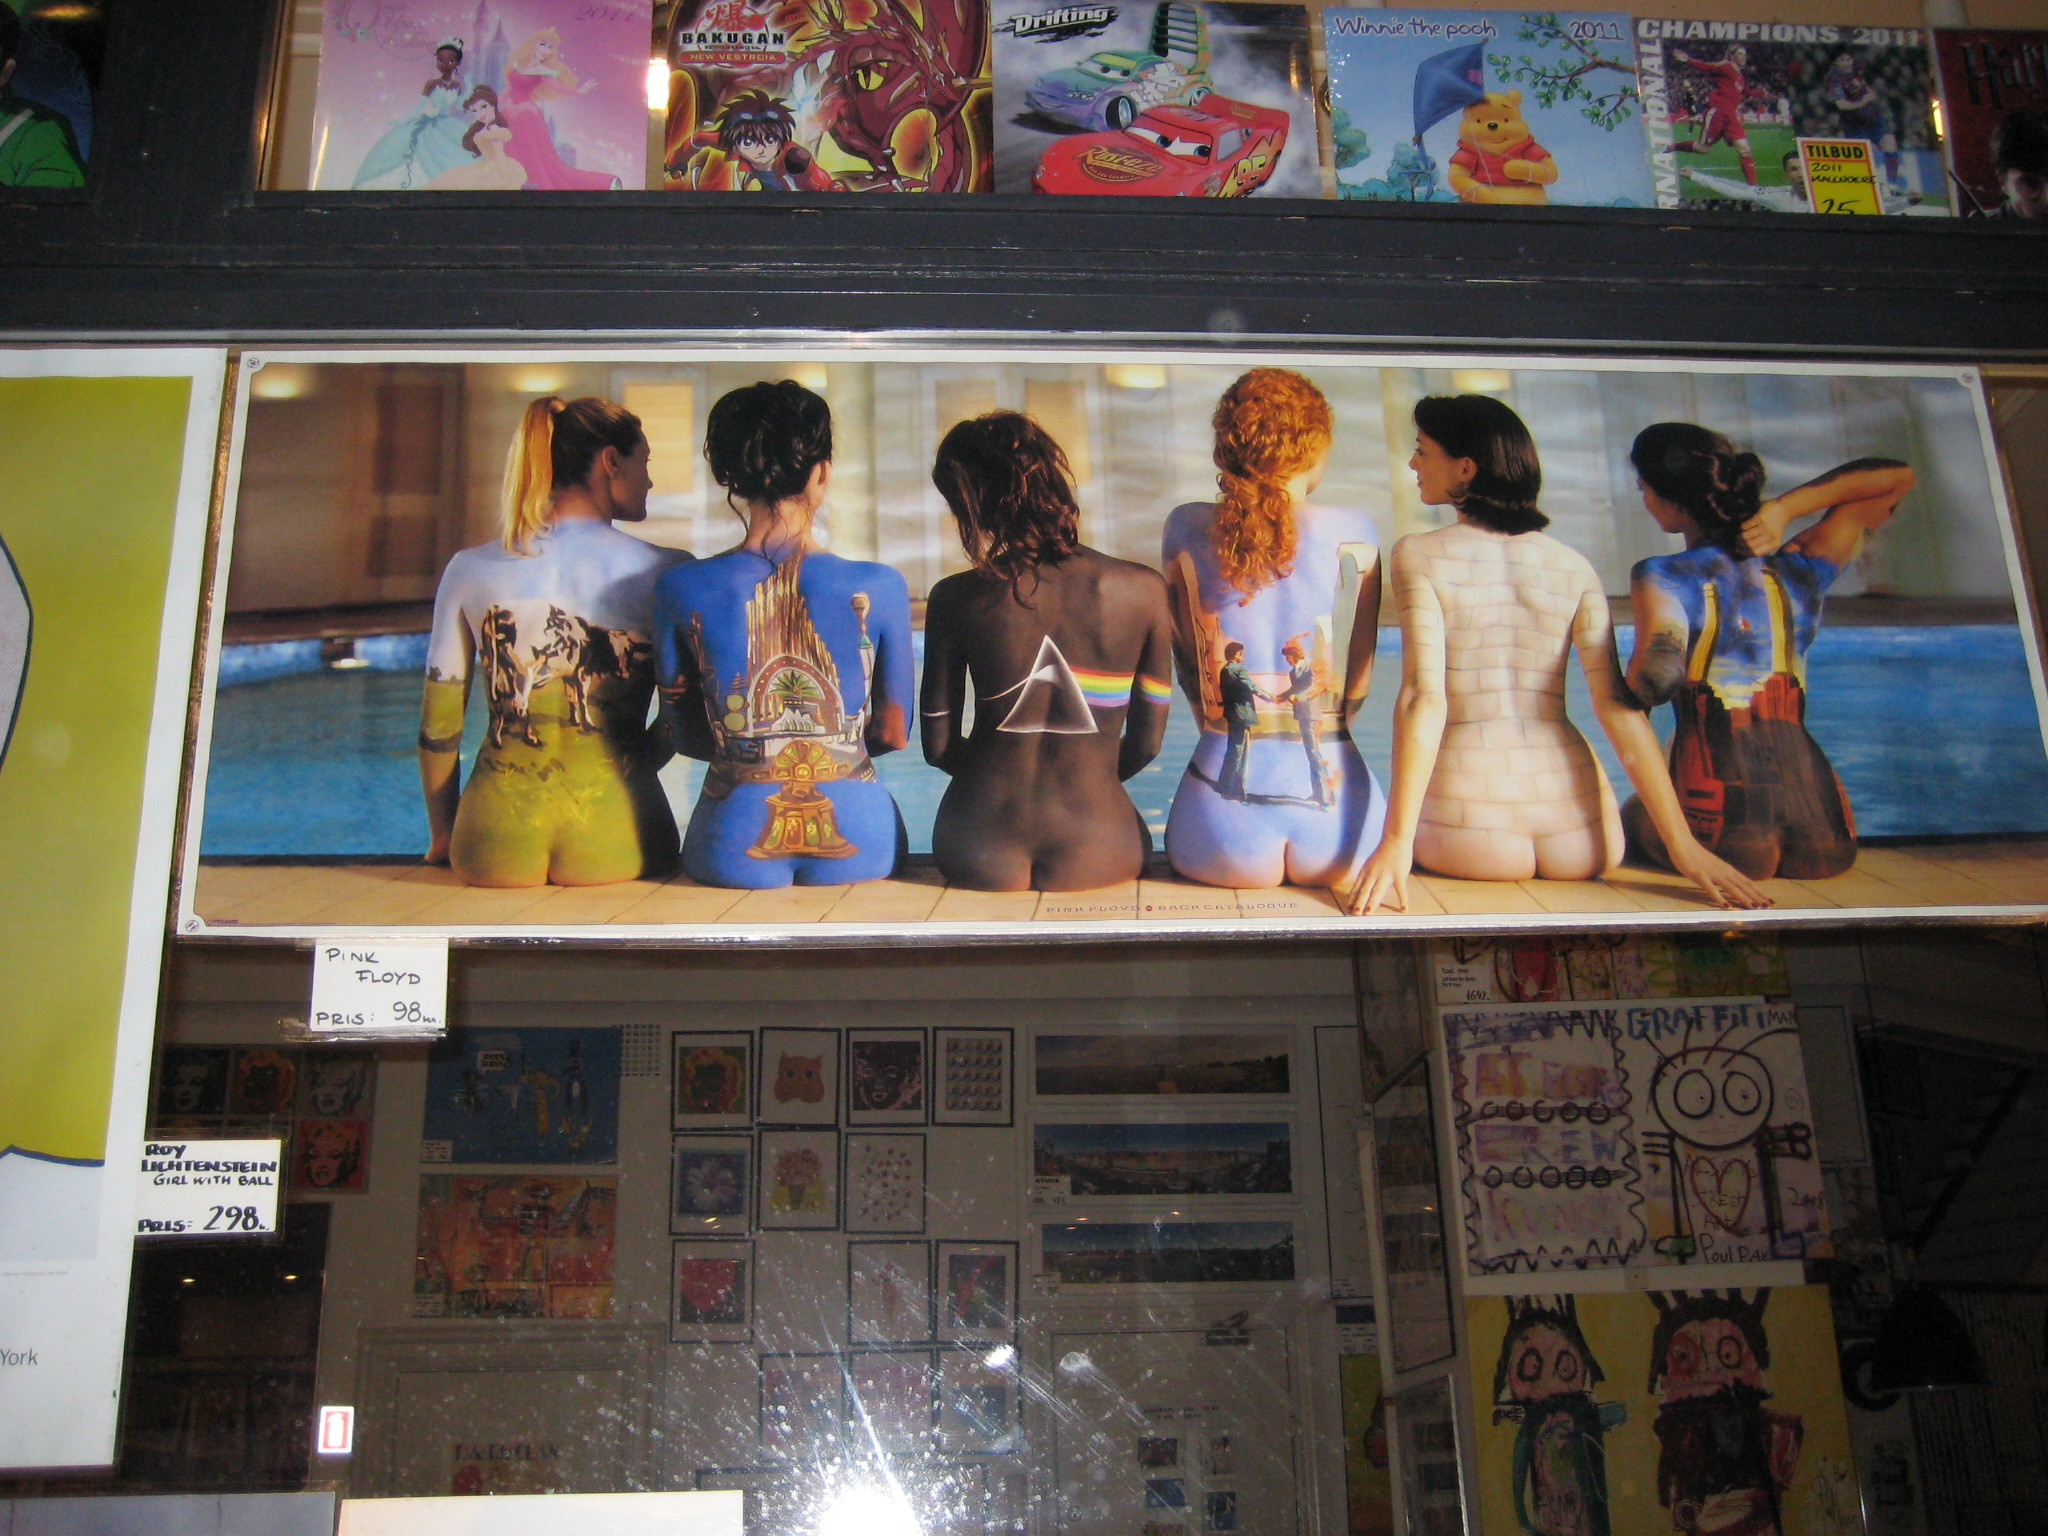 Pink Floyd album cover girls.